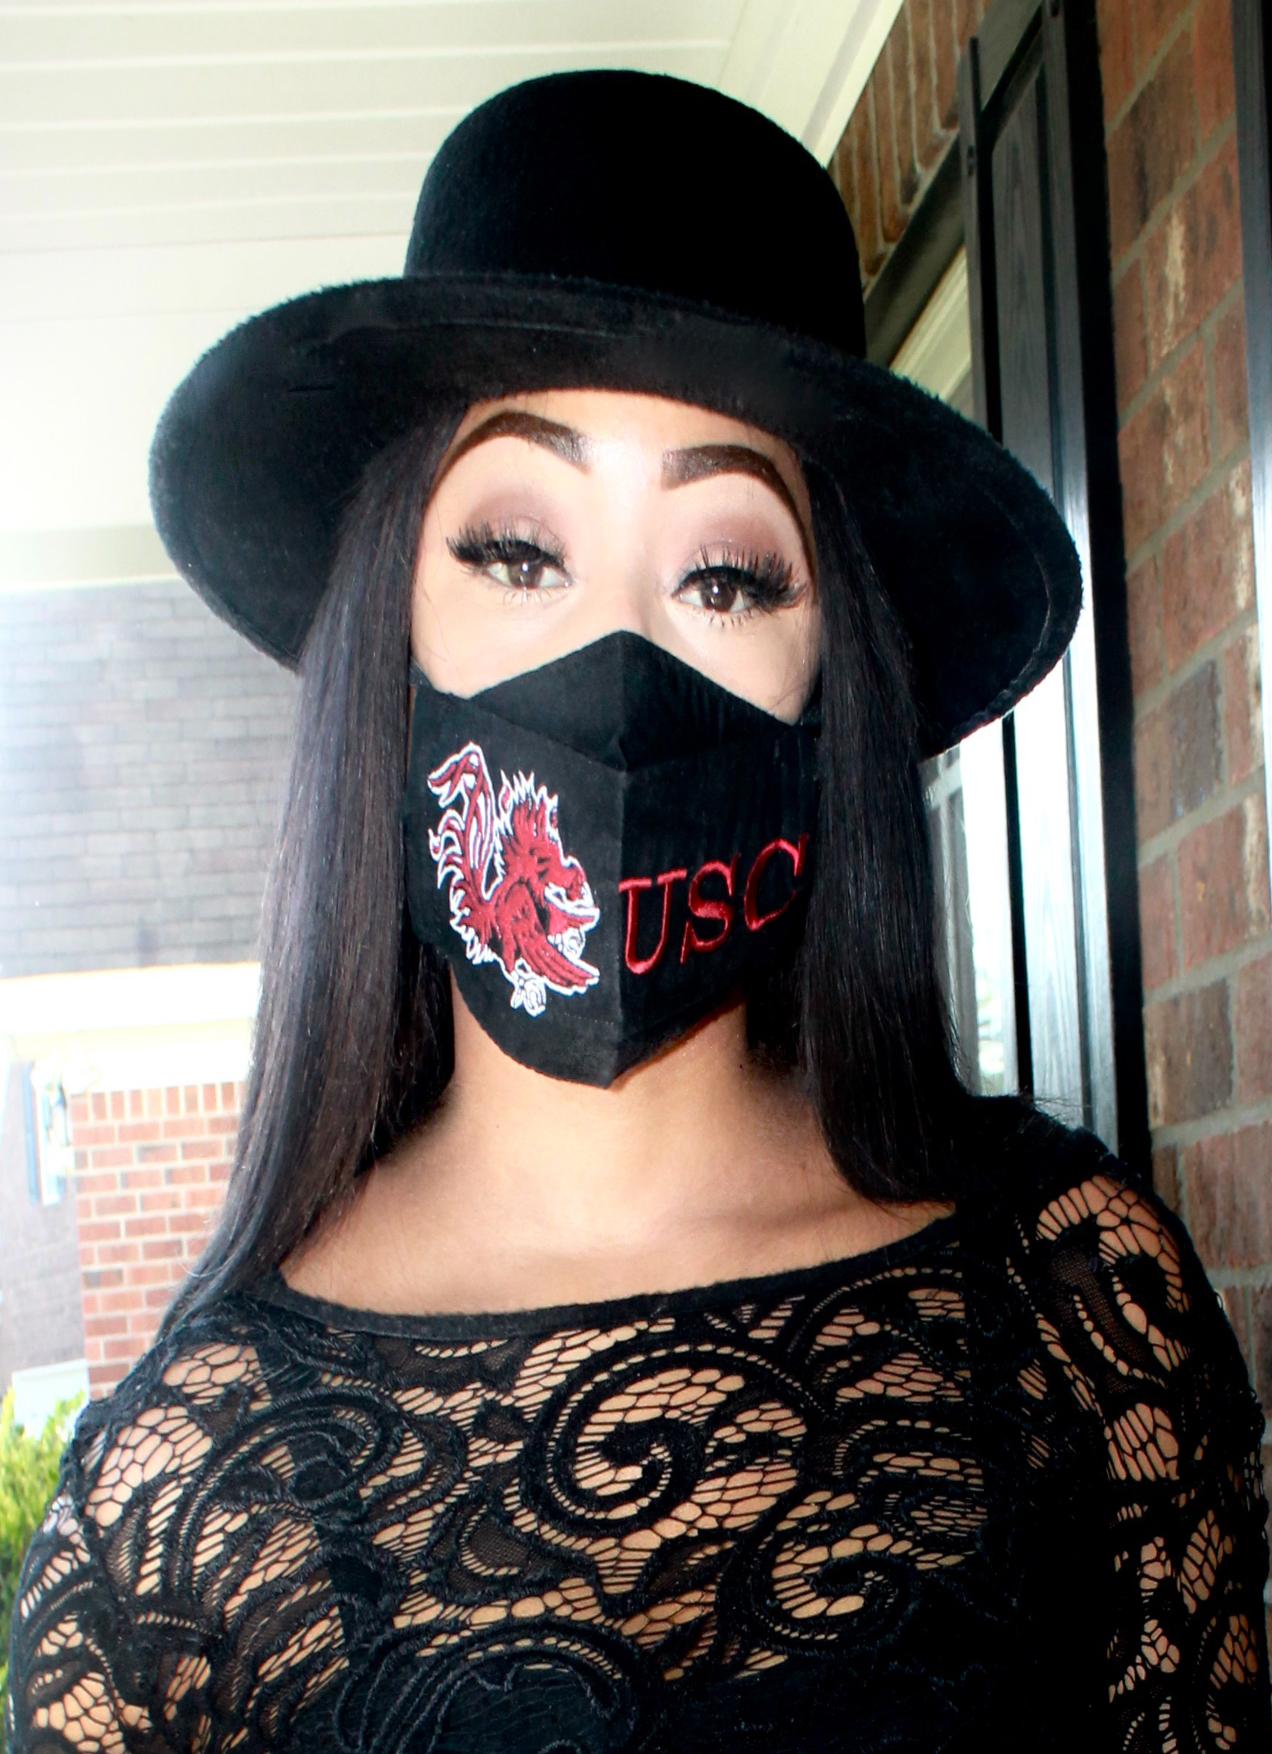 University of South Carolina Face Mask